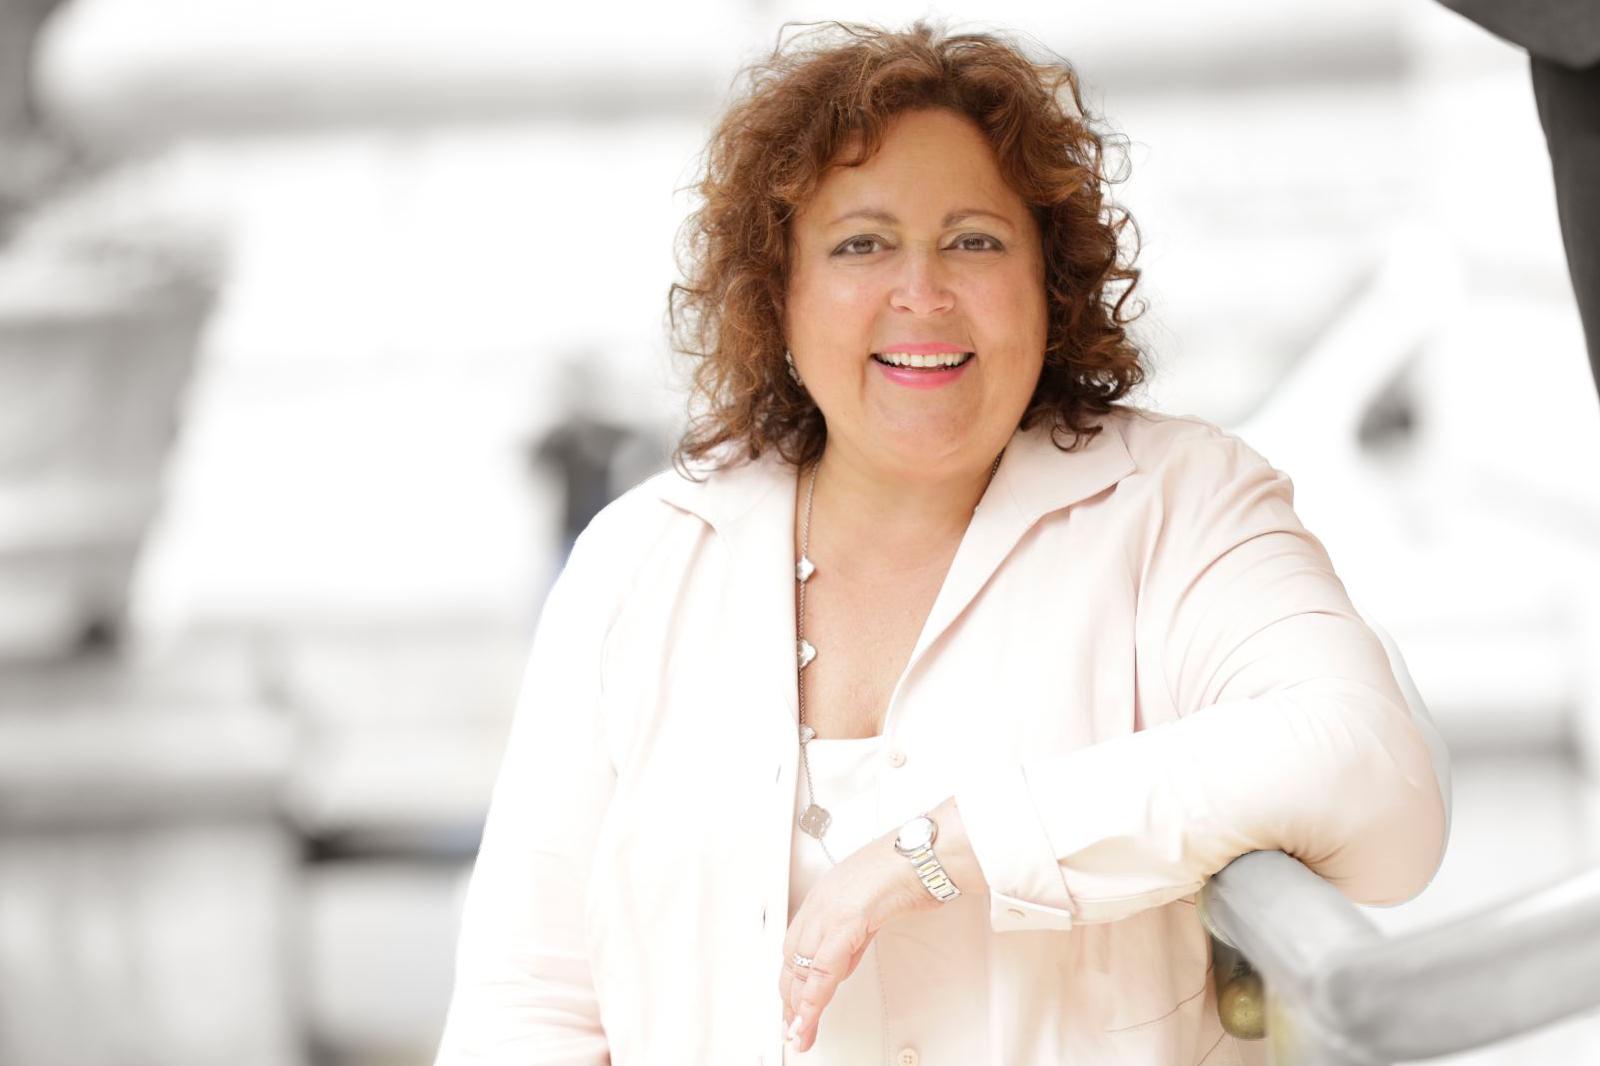 Insigniam Founding Partner Shideh Sedgh Bina Receives Achievement Award From IJWO